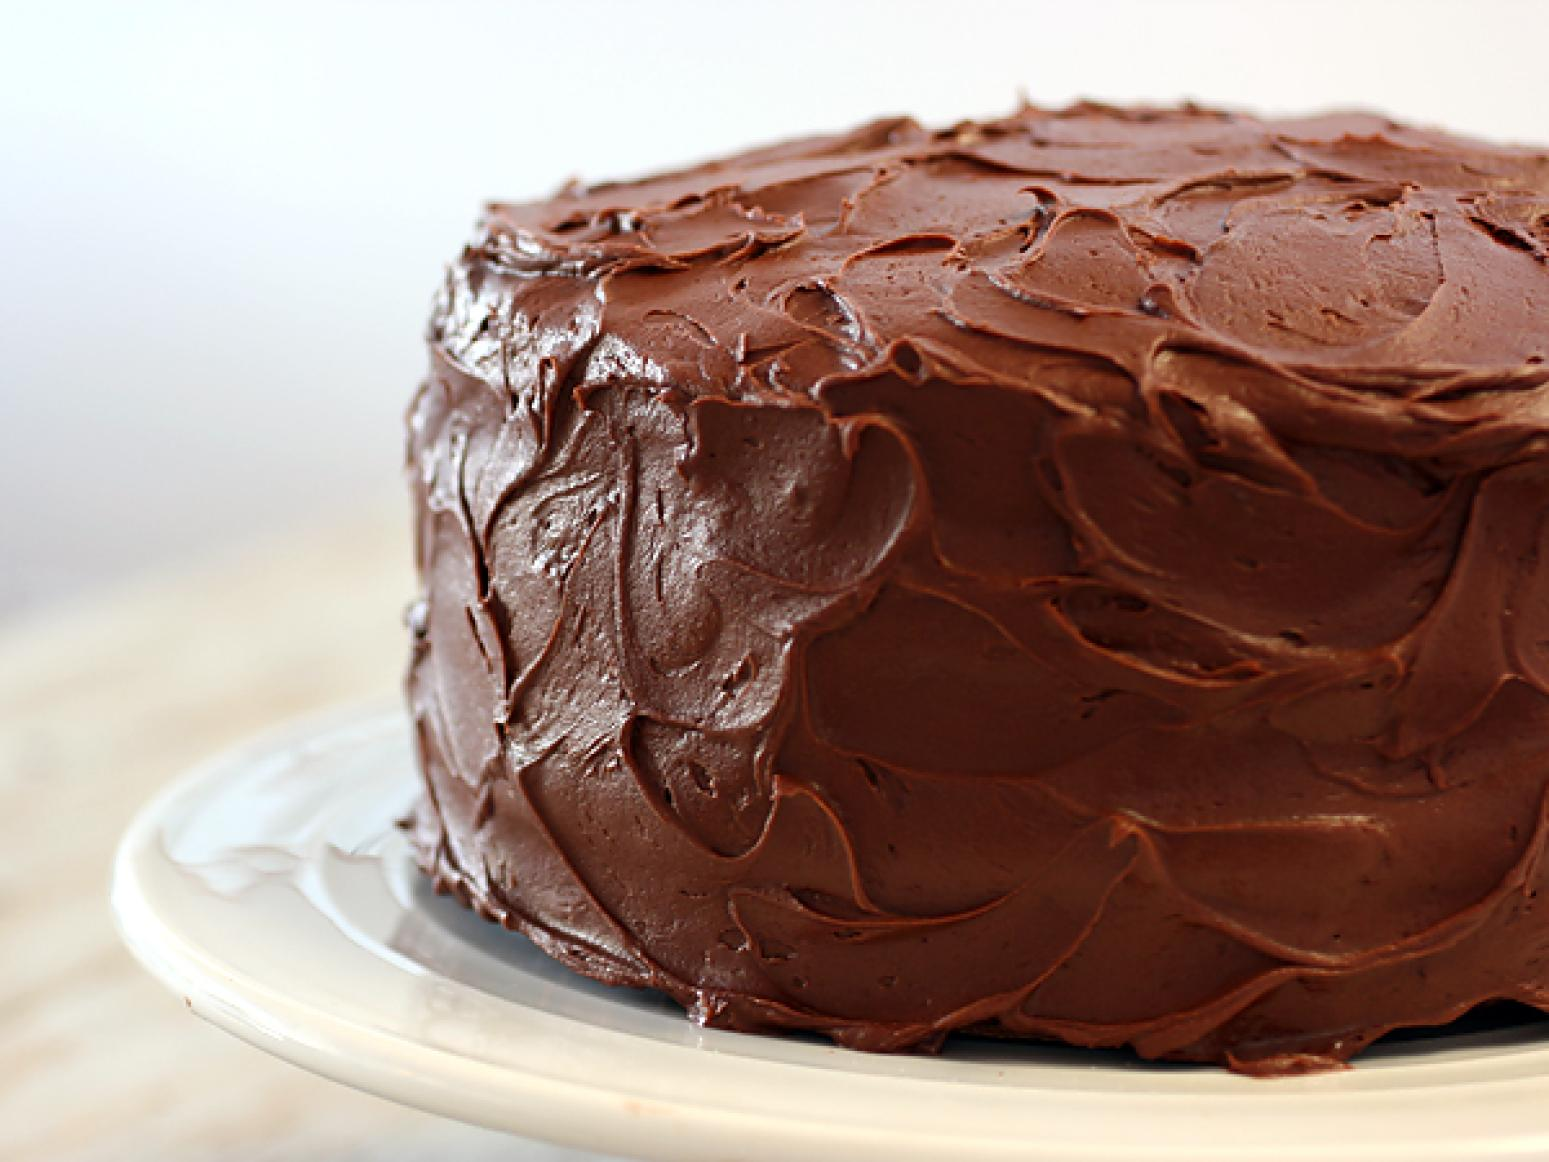 Old fashioned chocolate cake Recipe